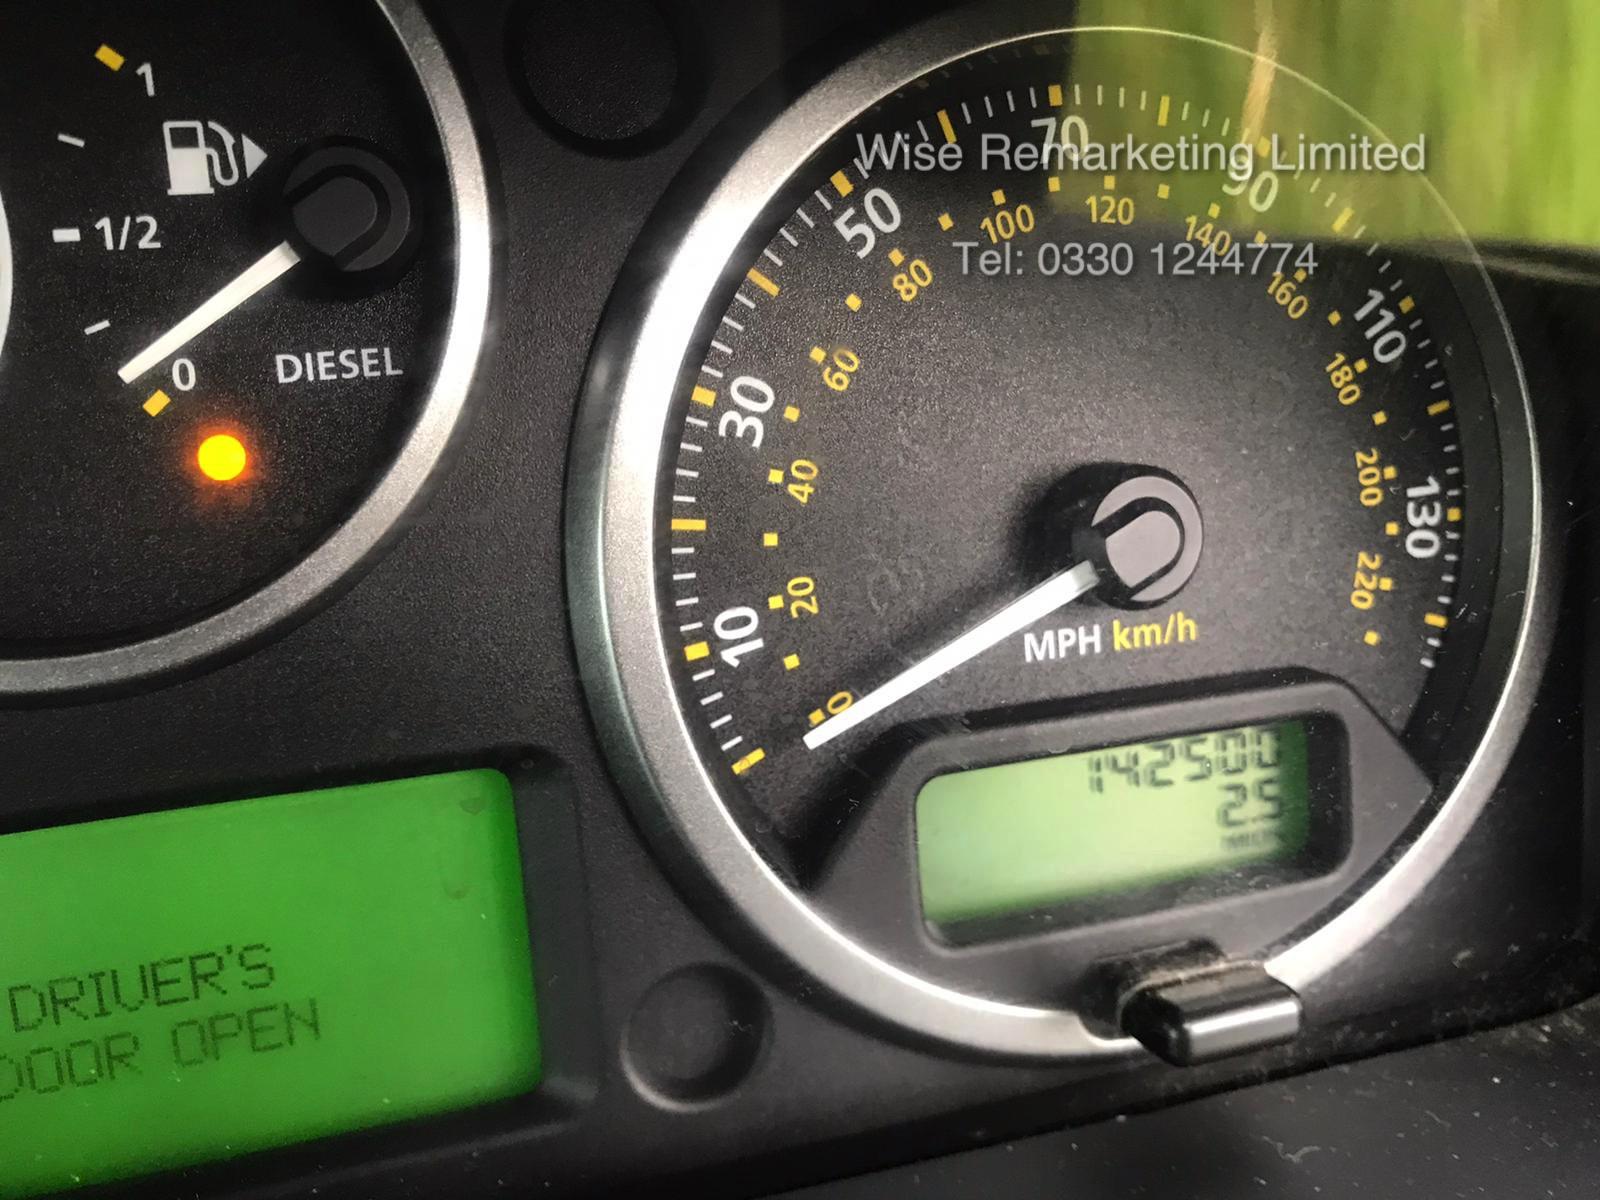 Lot 22 - Land Rover Freelander 2.2 TD4 E - 2009 - Service History - 4x4 - 1 Year MOT